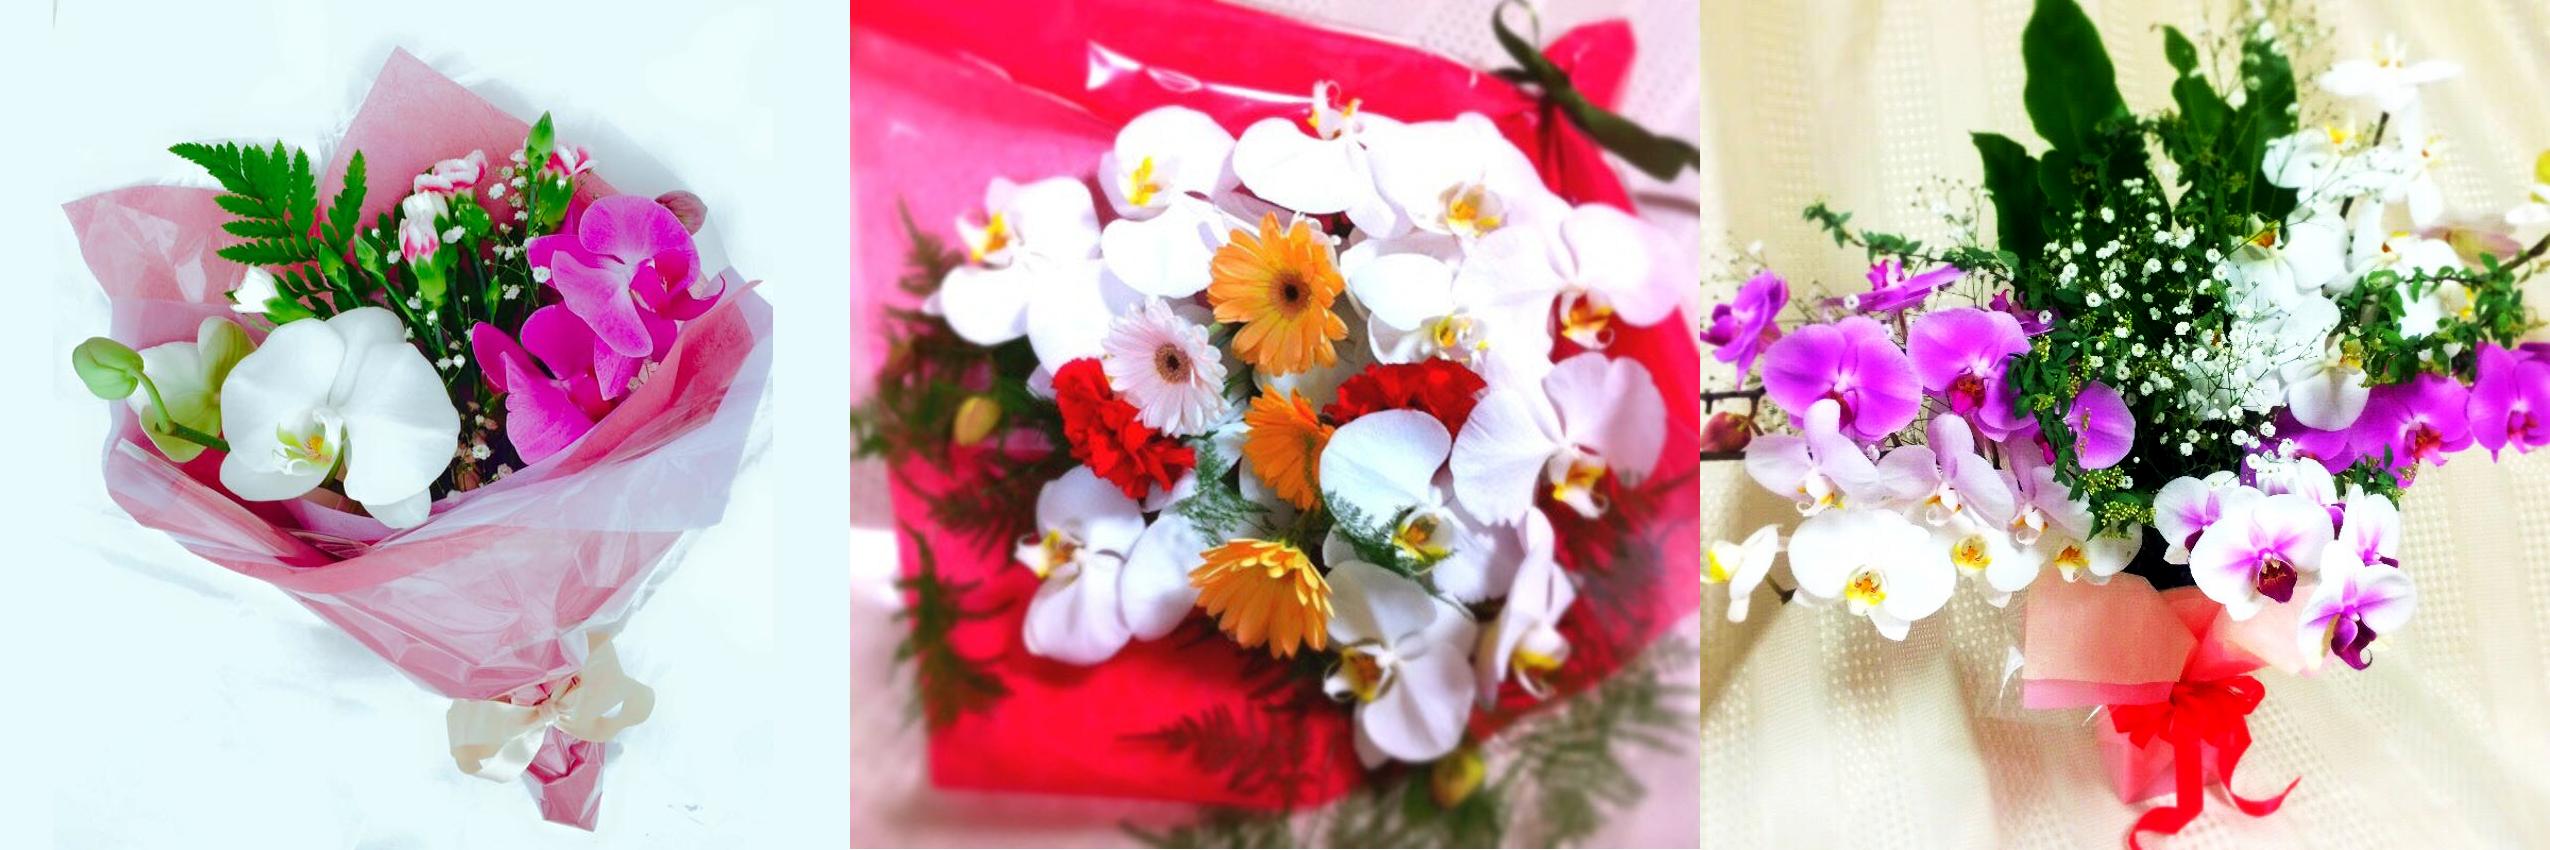 胡蝶蘭の花束三種類